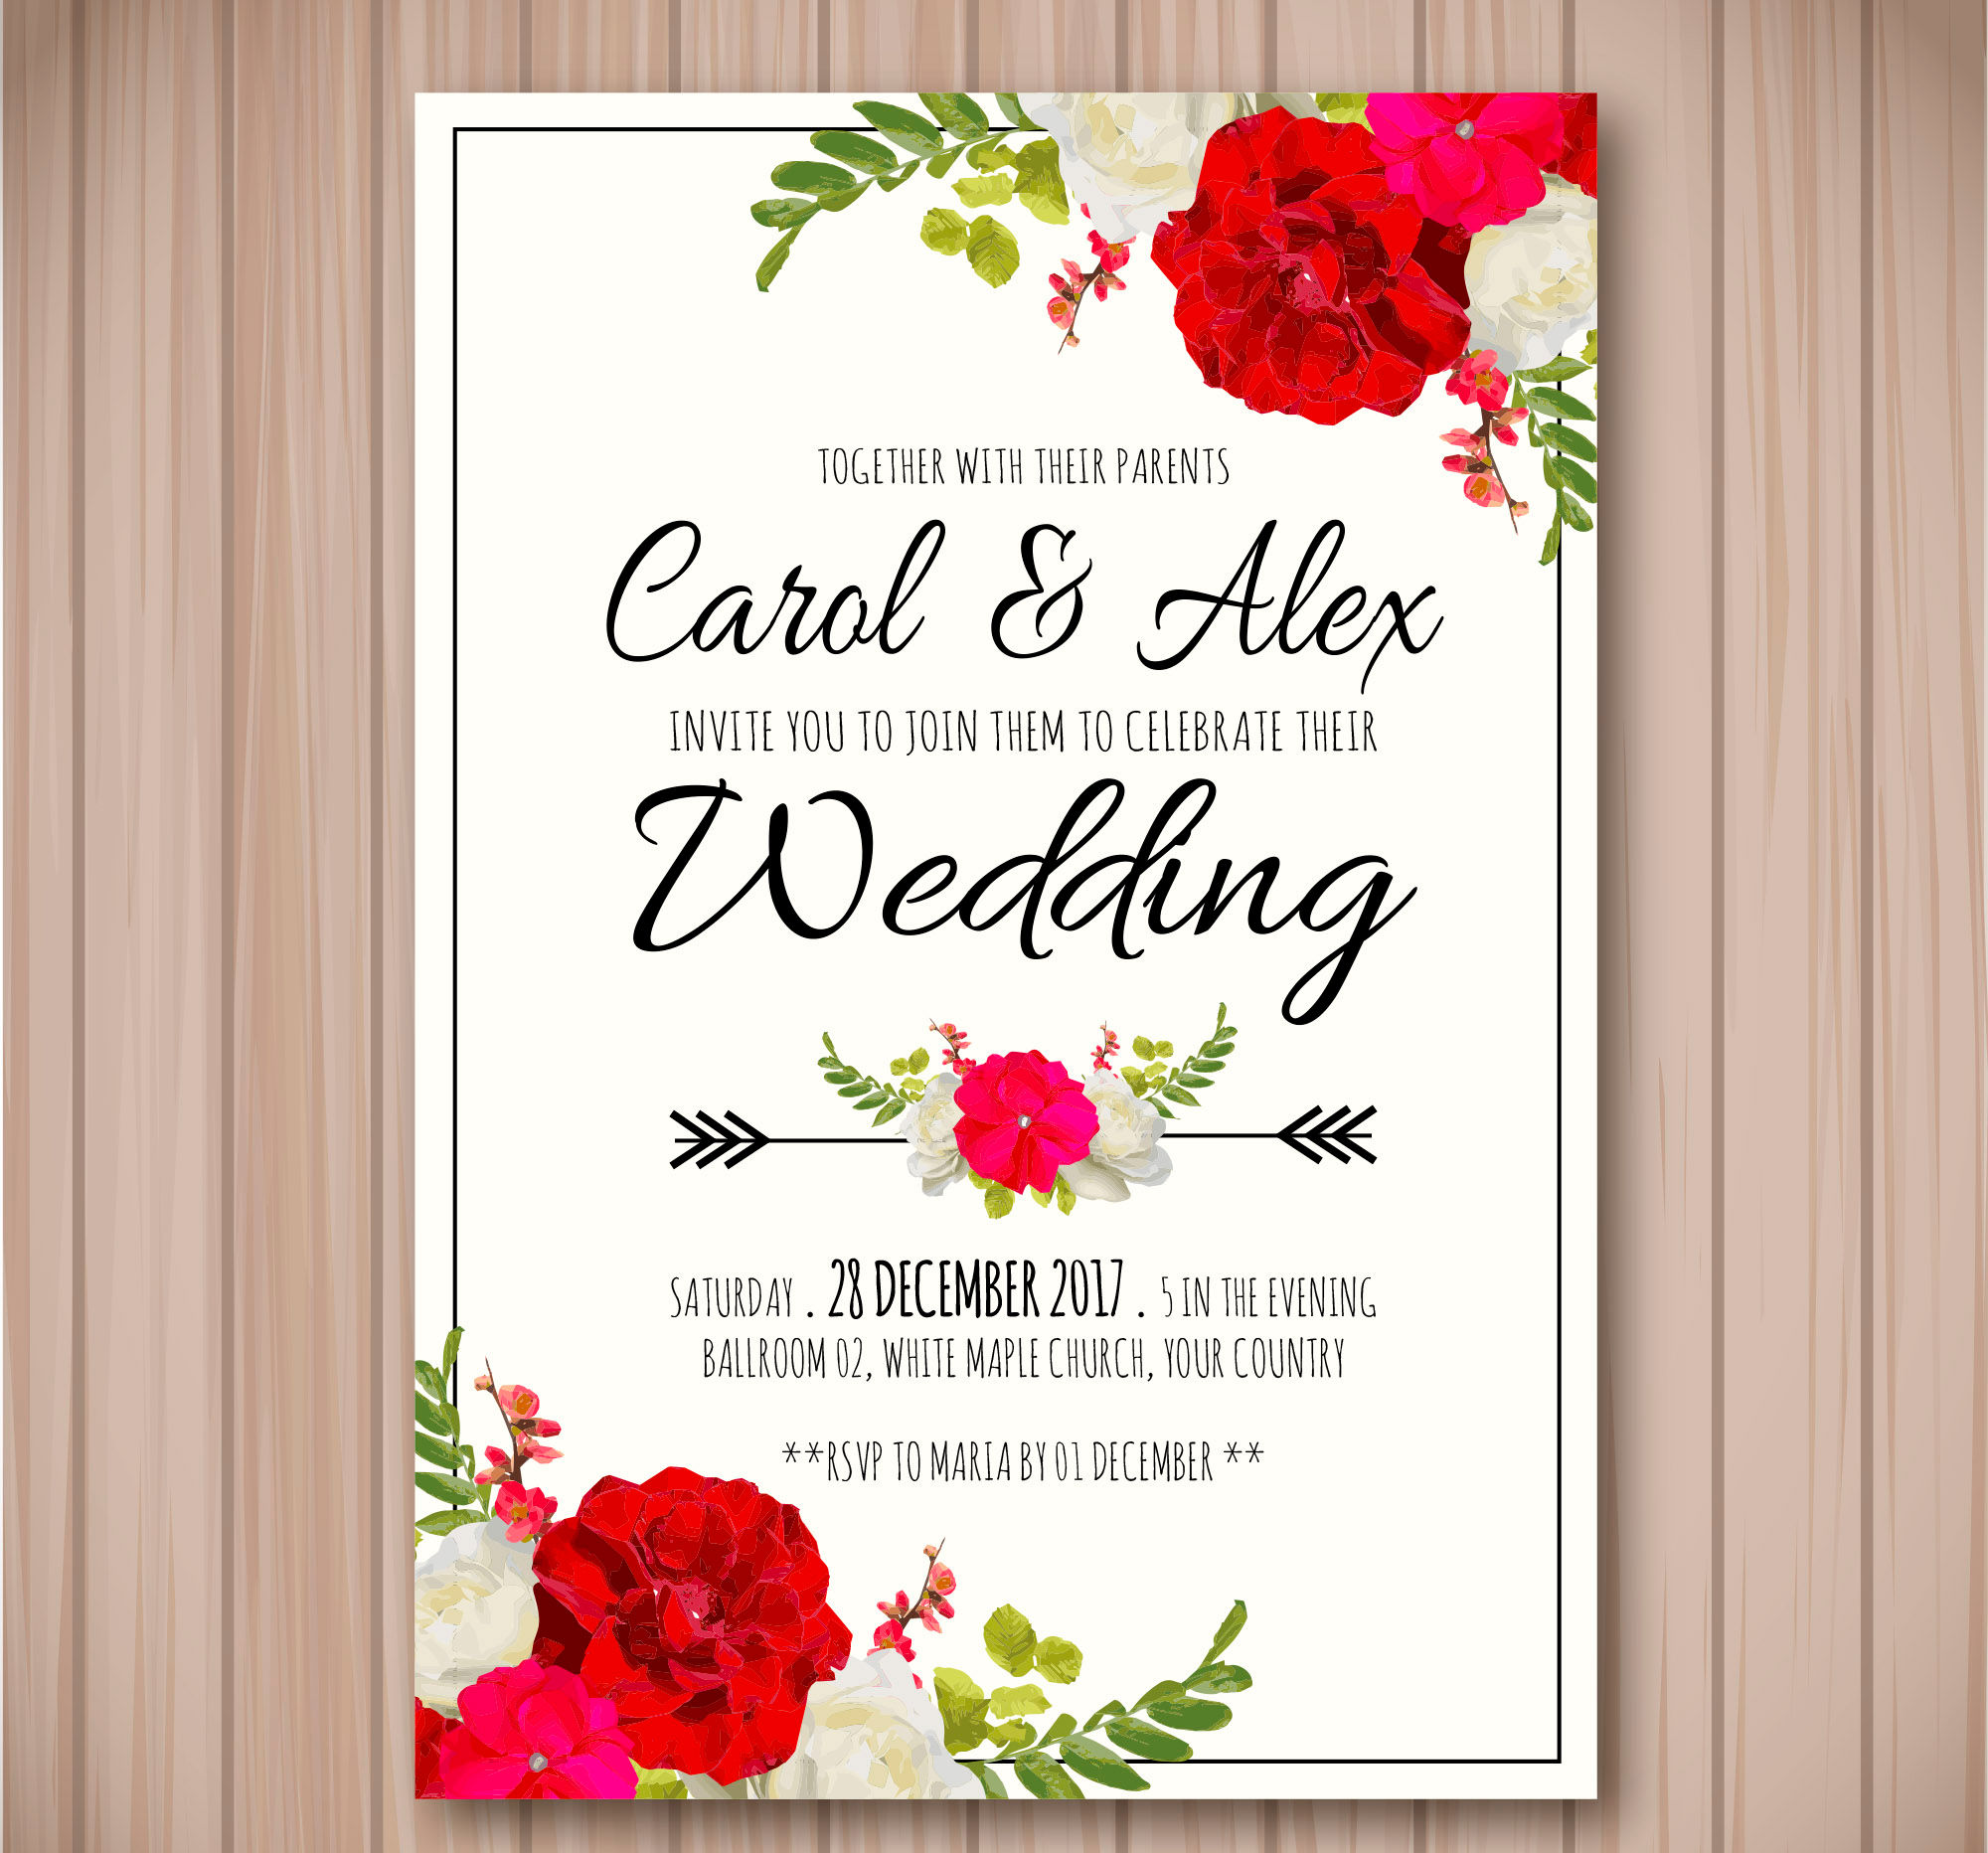 watercolor flowers wedding invitation1